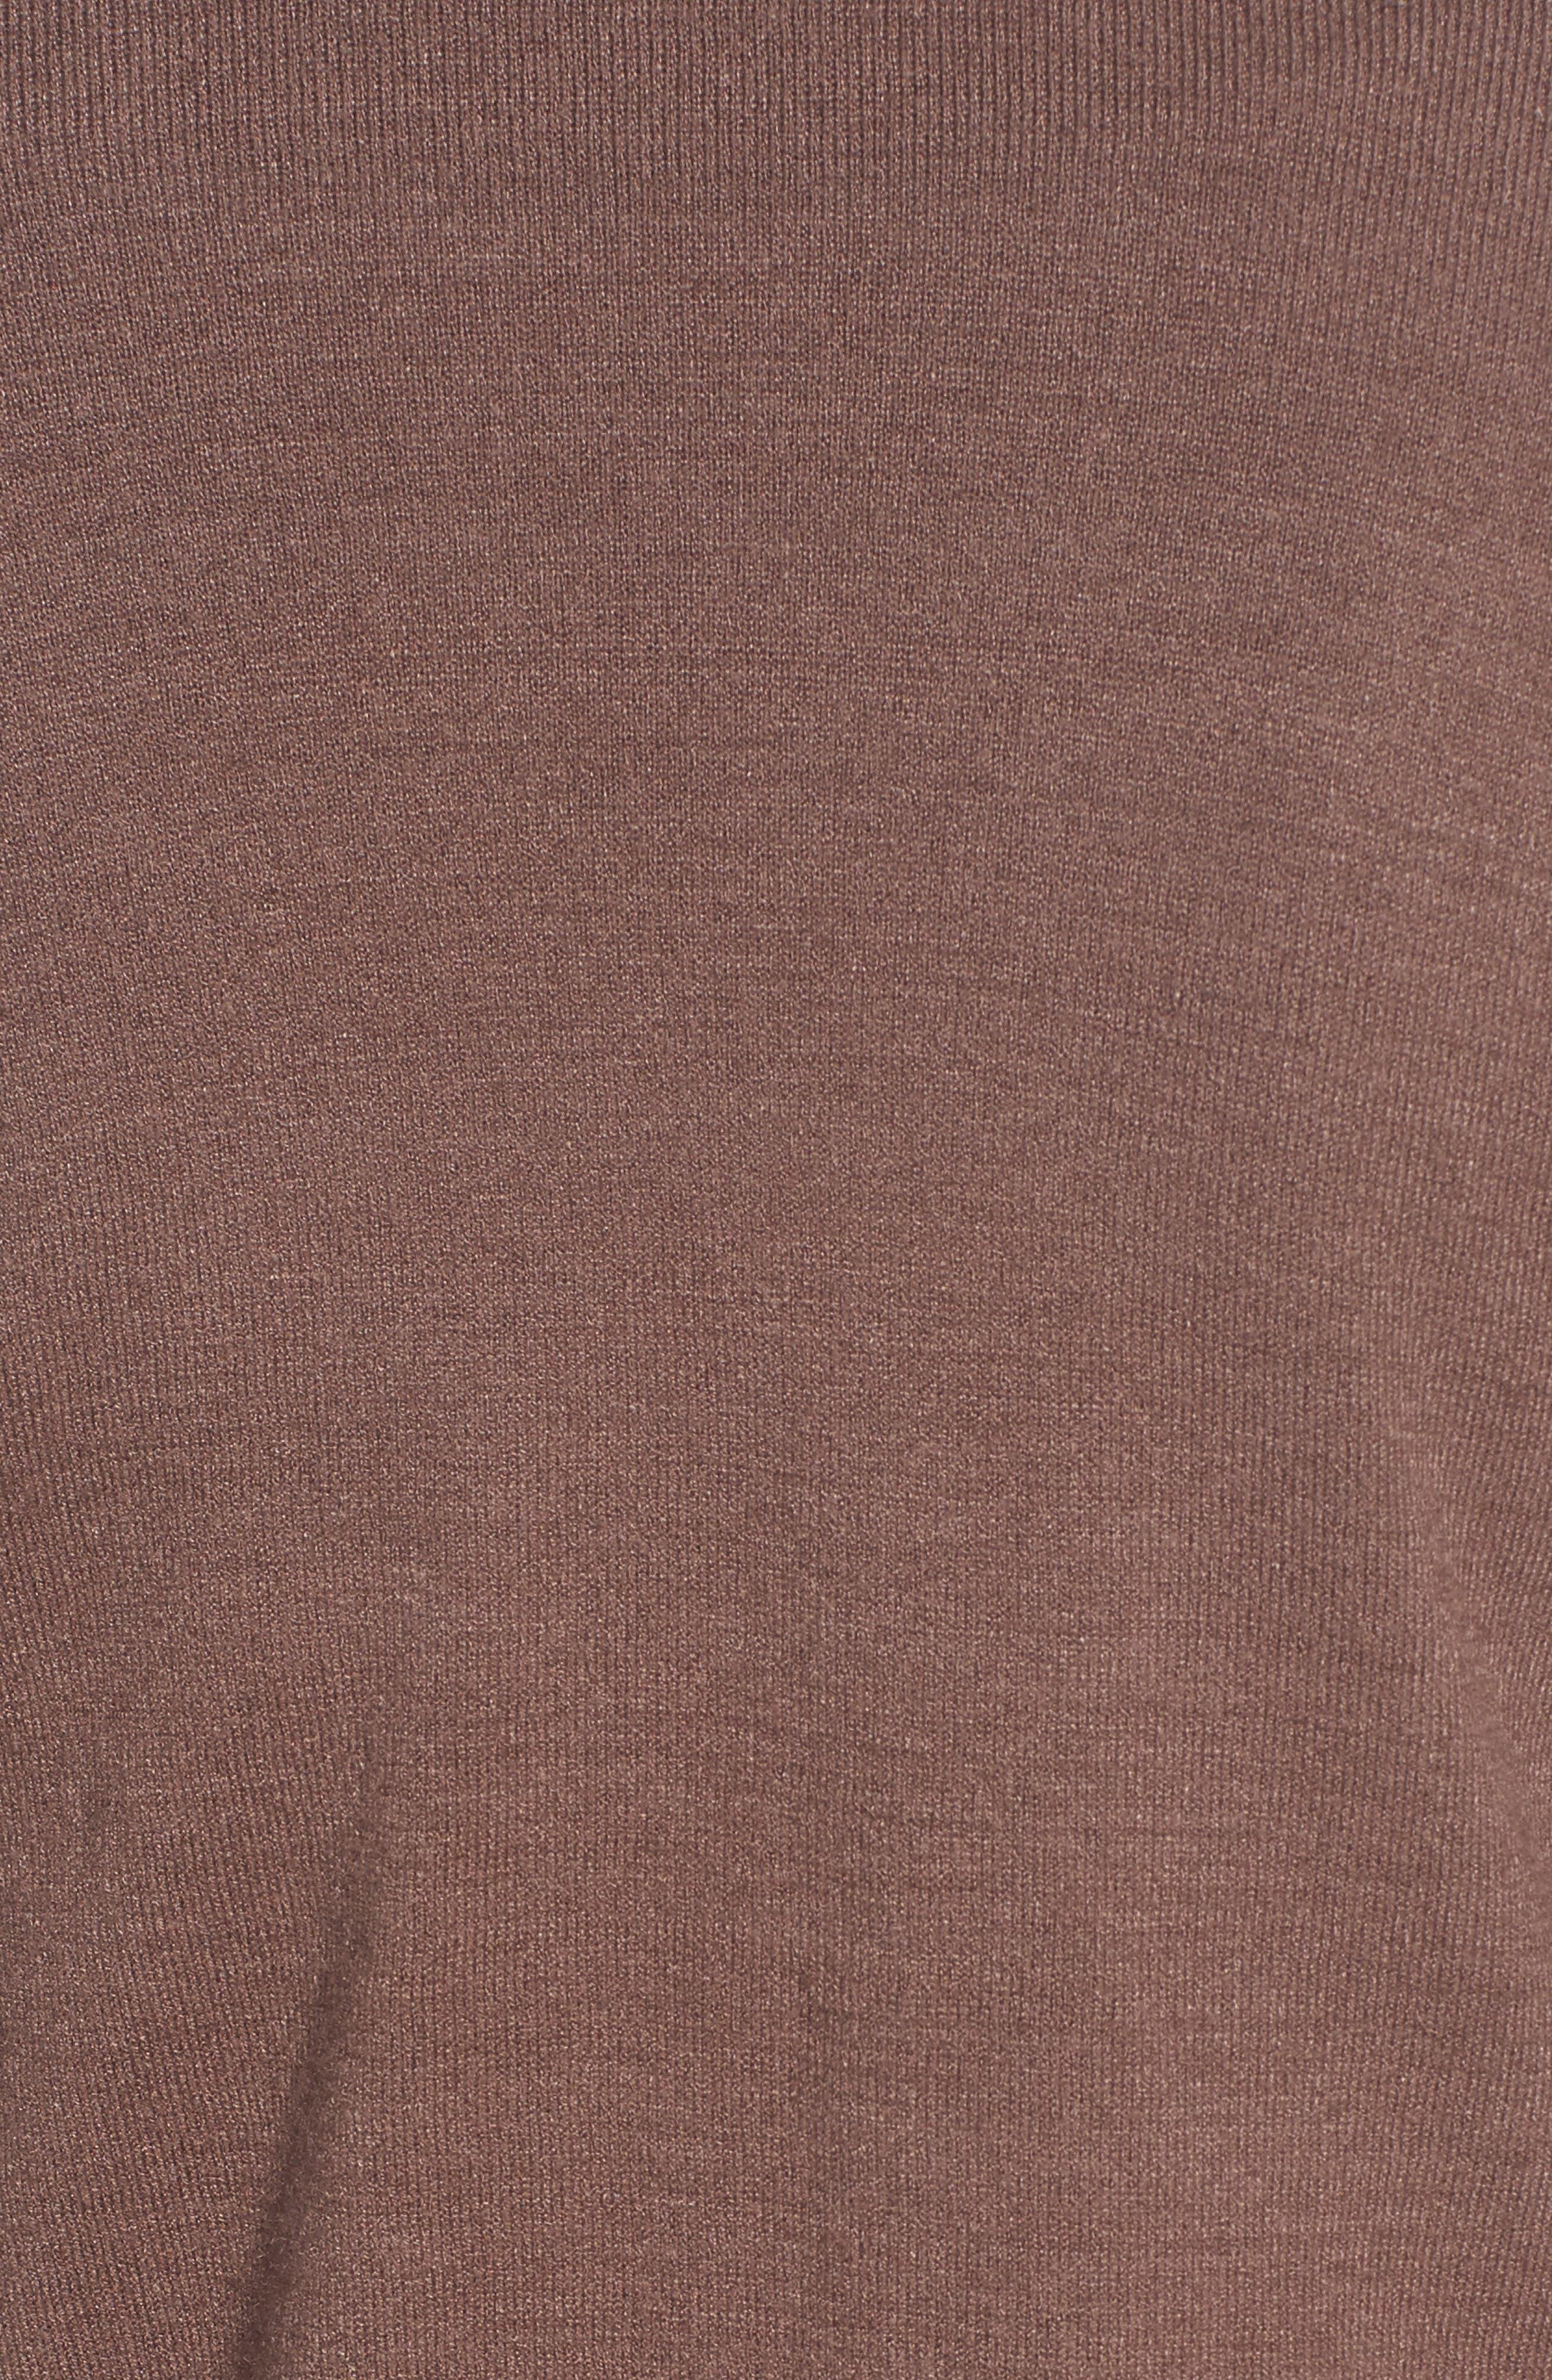 Alternate Image 5  - Hinge Ruched Bell Sleeve Cardigan